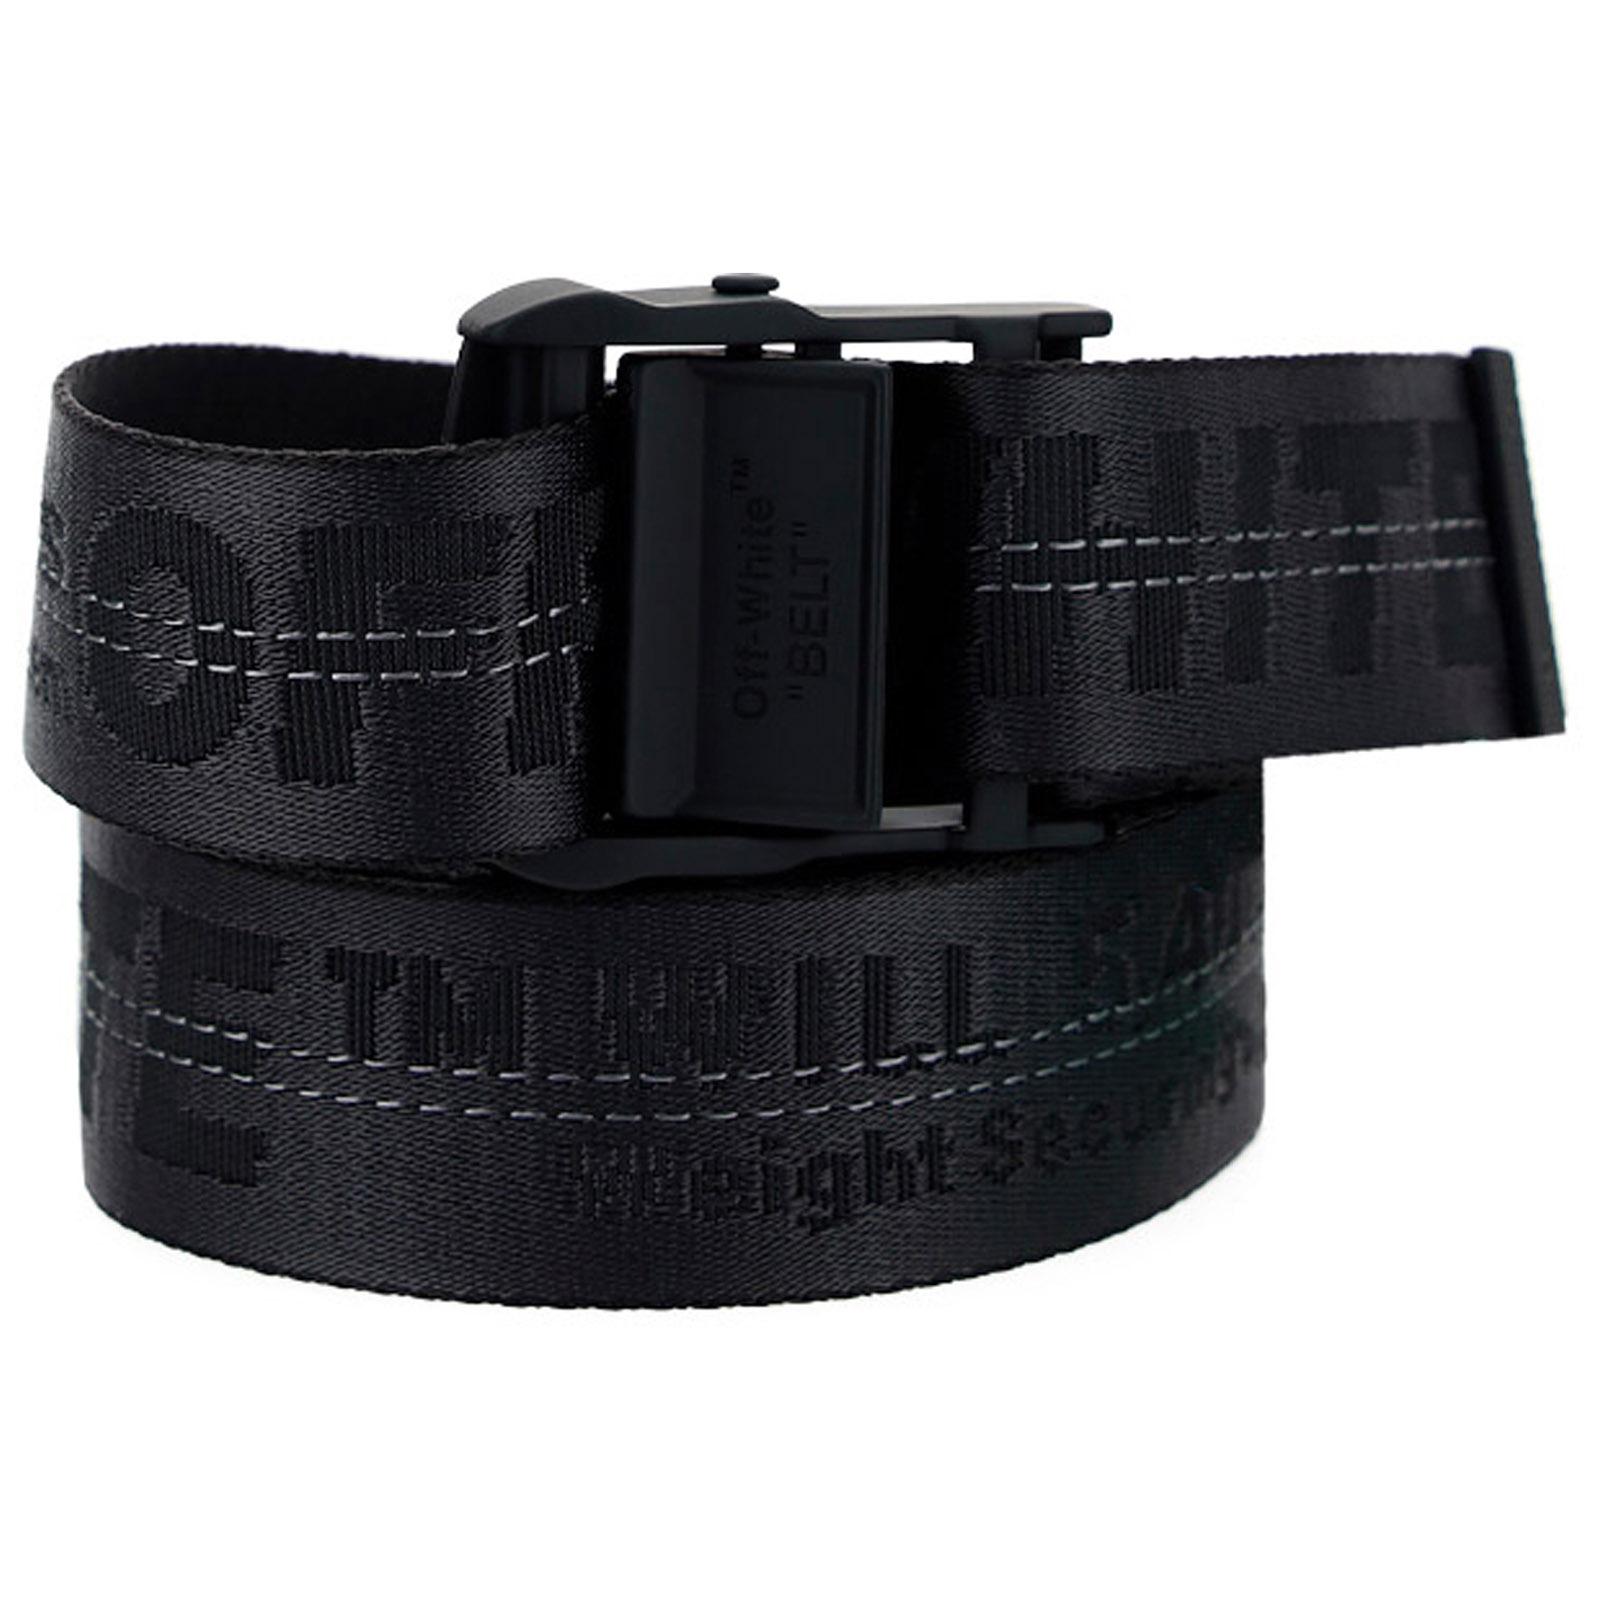 Off-White Belts MEN'S BELT  INDUSTRIAL